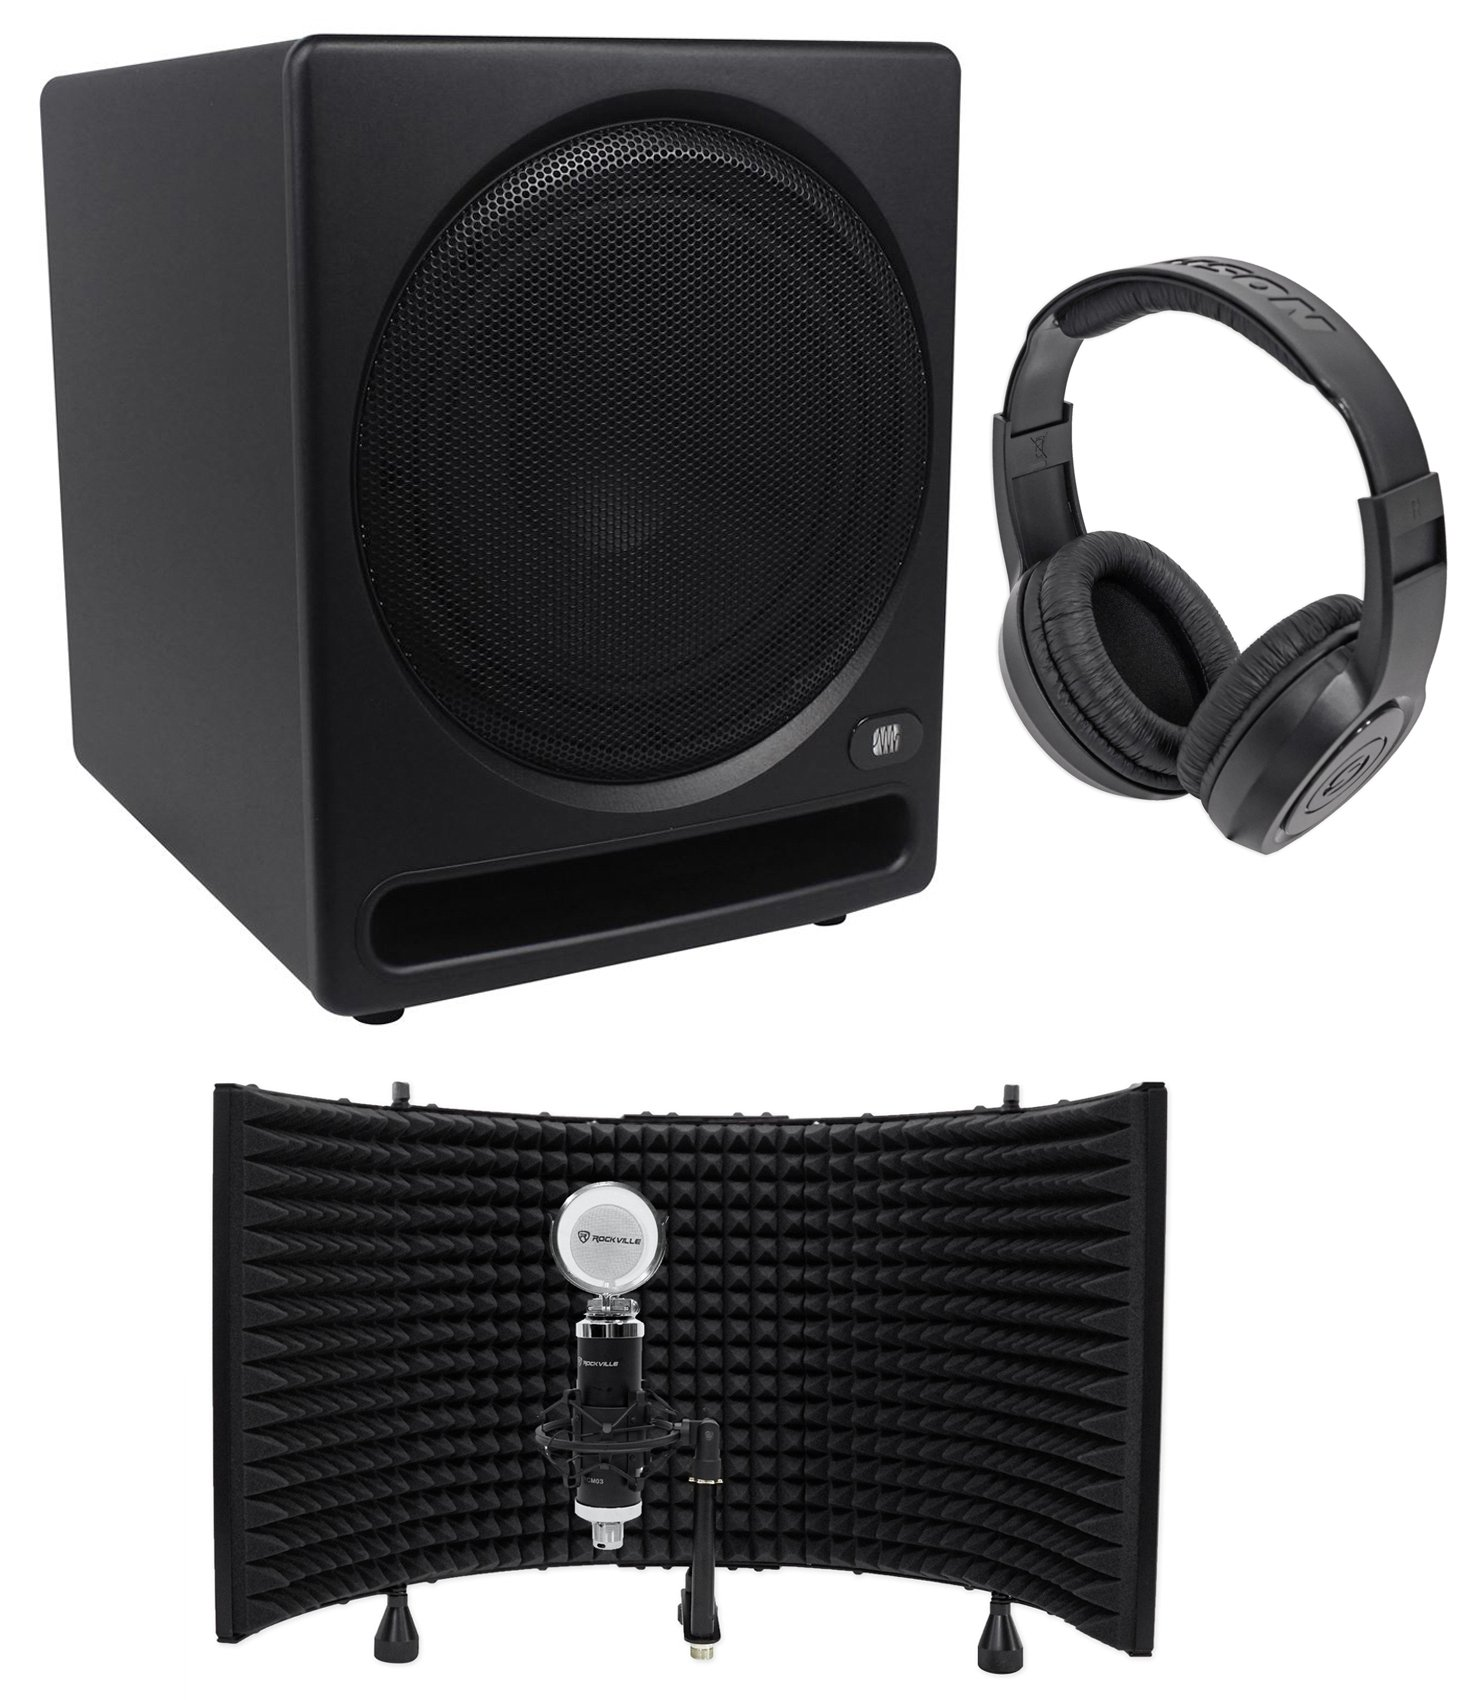 Presonus Temblor T10 10'' 250 Watt Active Studio Subwoofer+Mic+Shield+Speaker